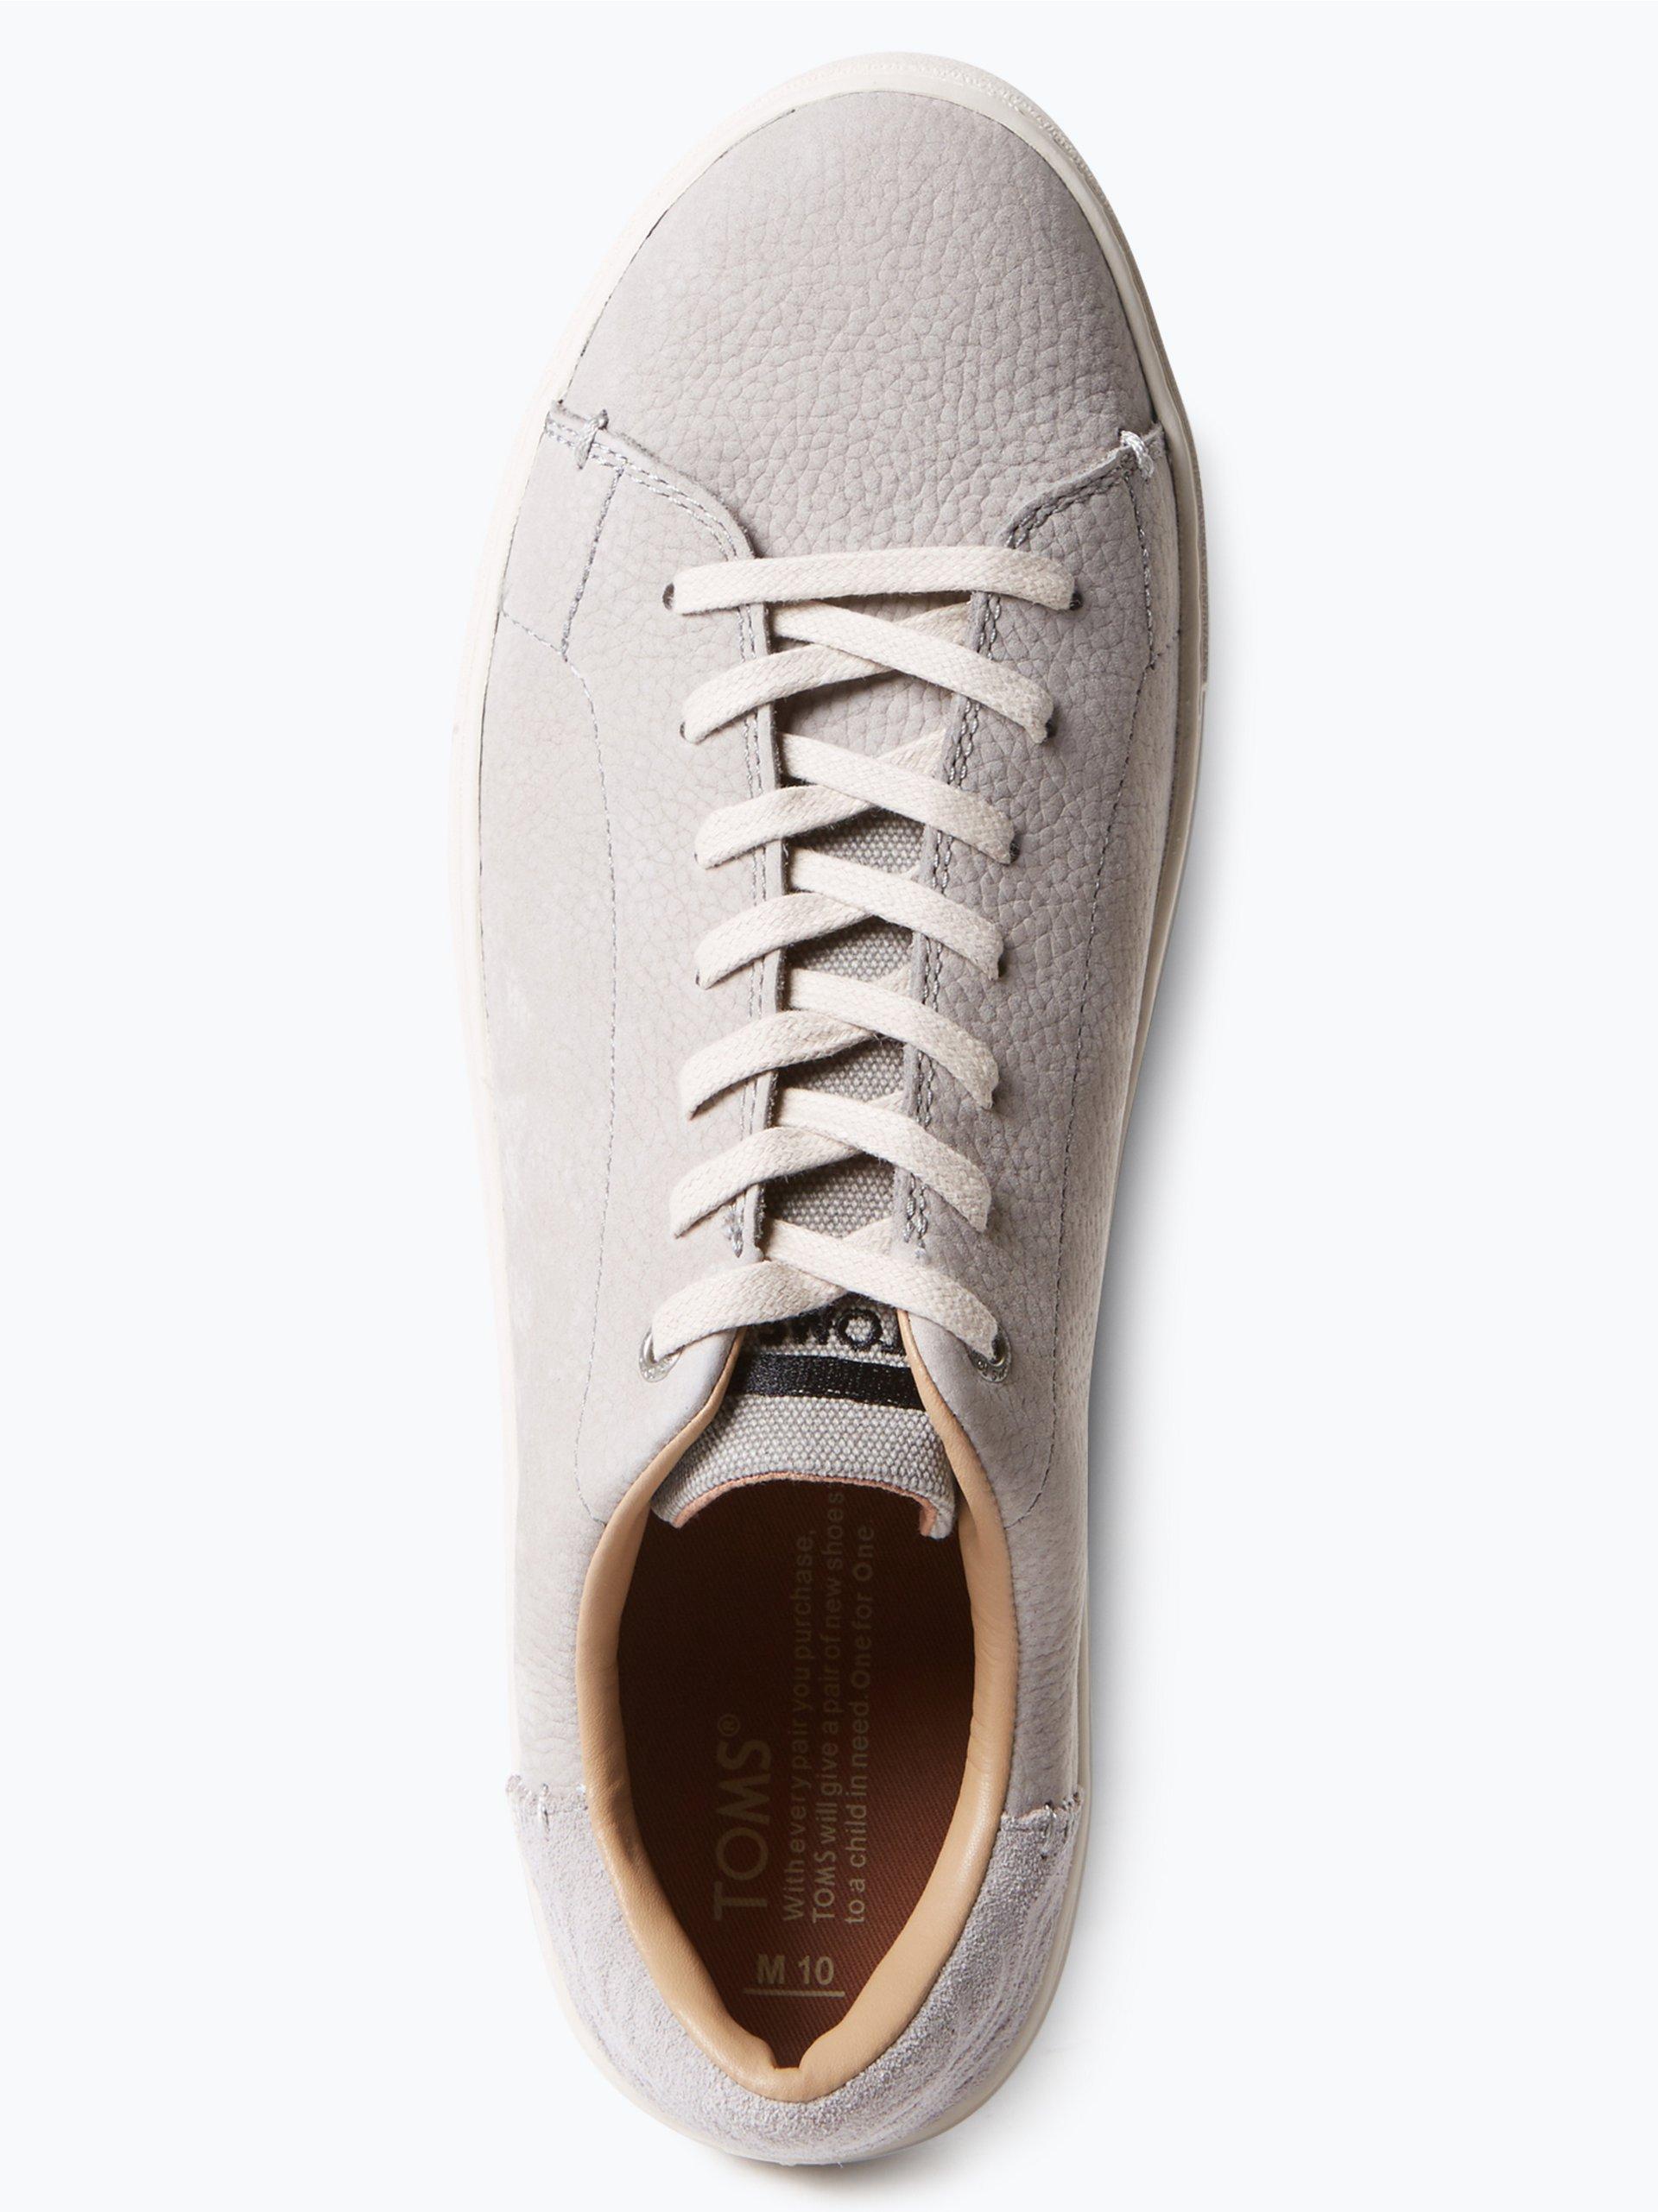 TOMS Herren Sneaker mit Leder-Anteil